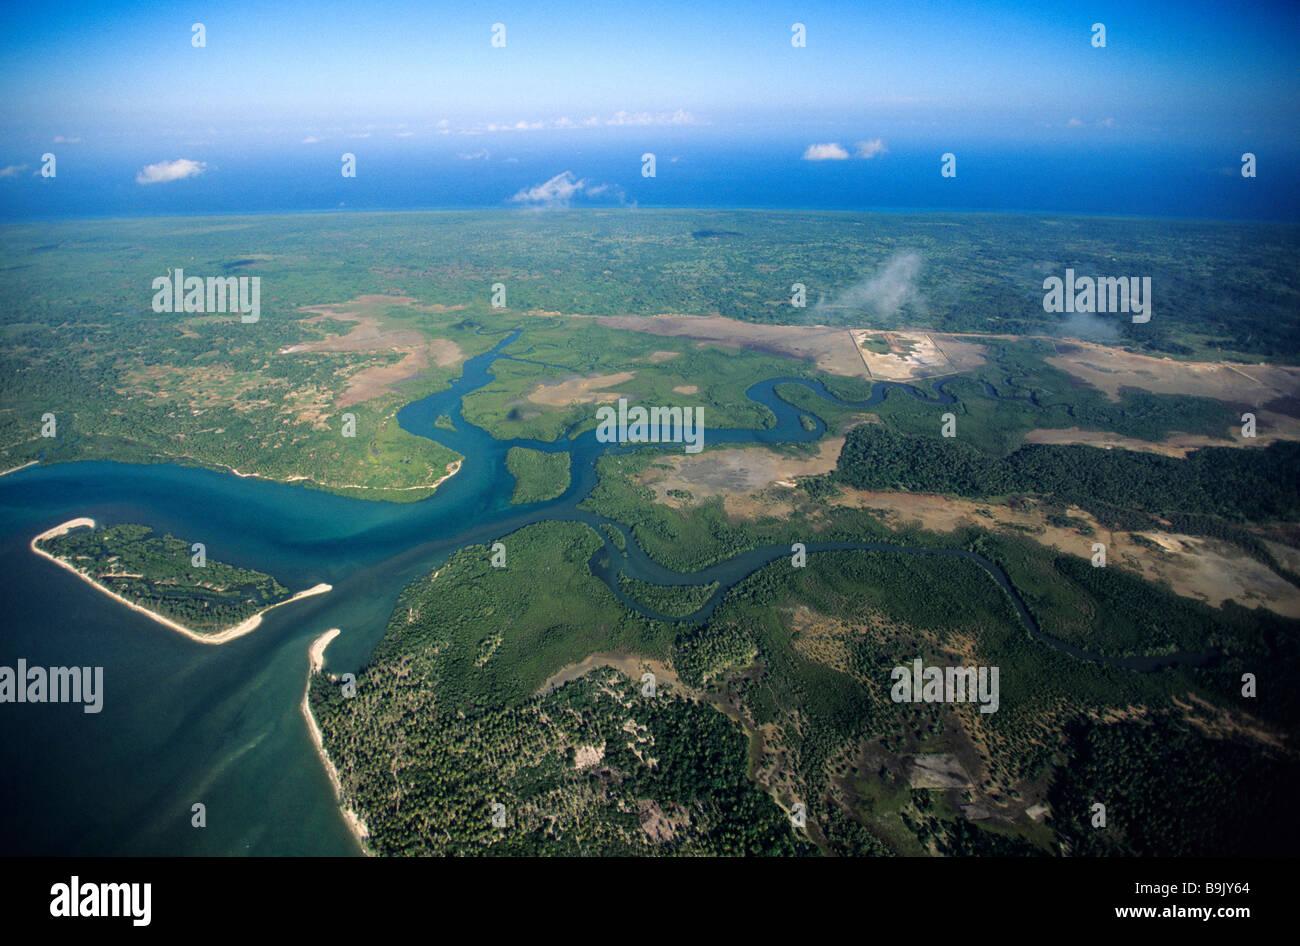 Tanzania, Zanzibar Archipelago, Mafia island, to the south of Unguja island, former trading post between Kilwa and - Stock Image